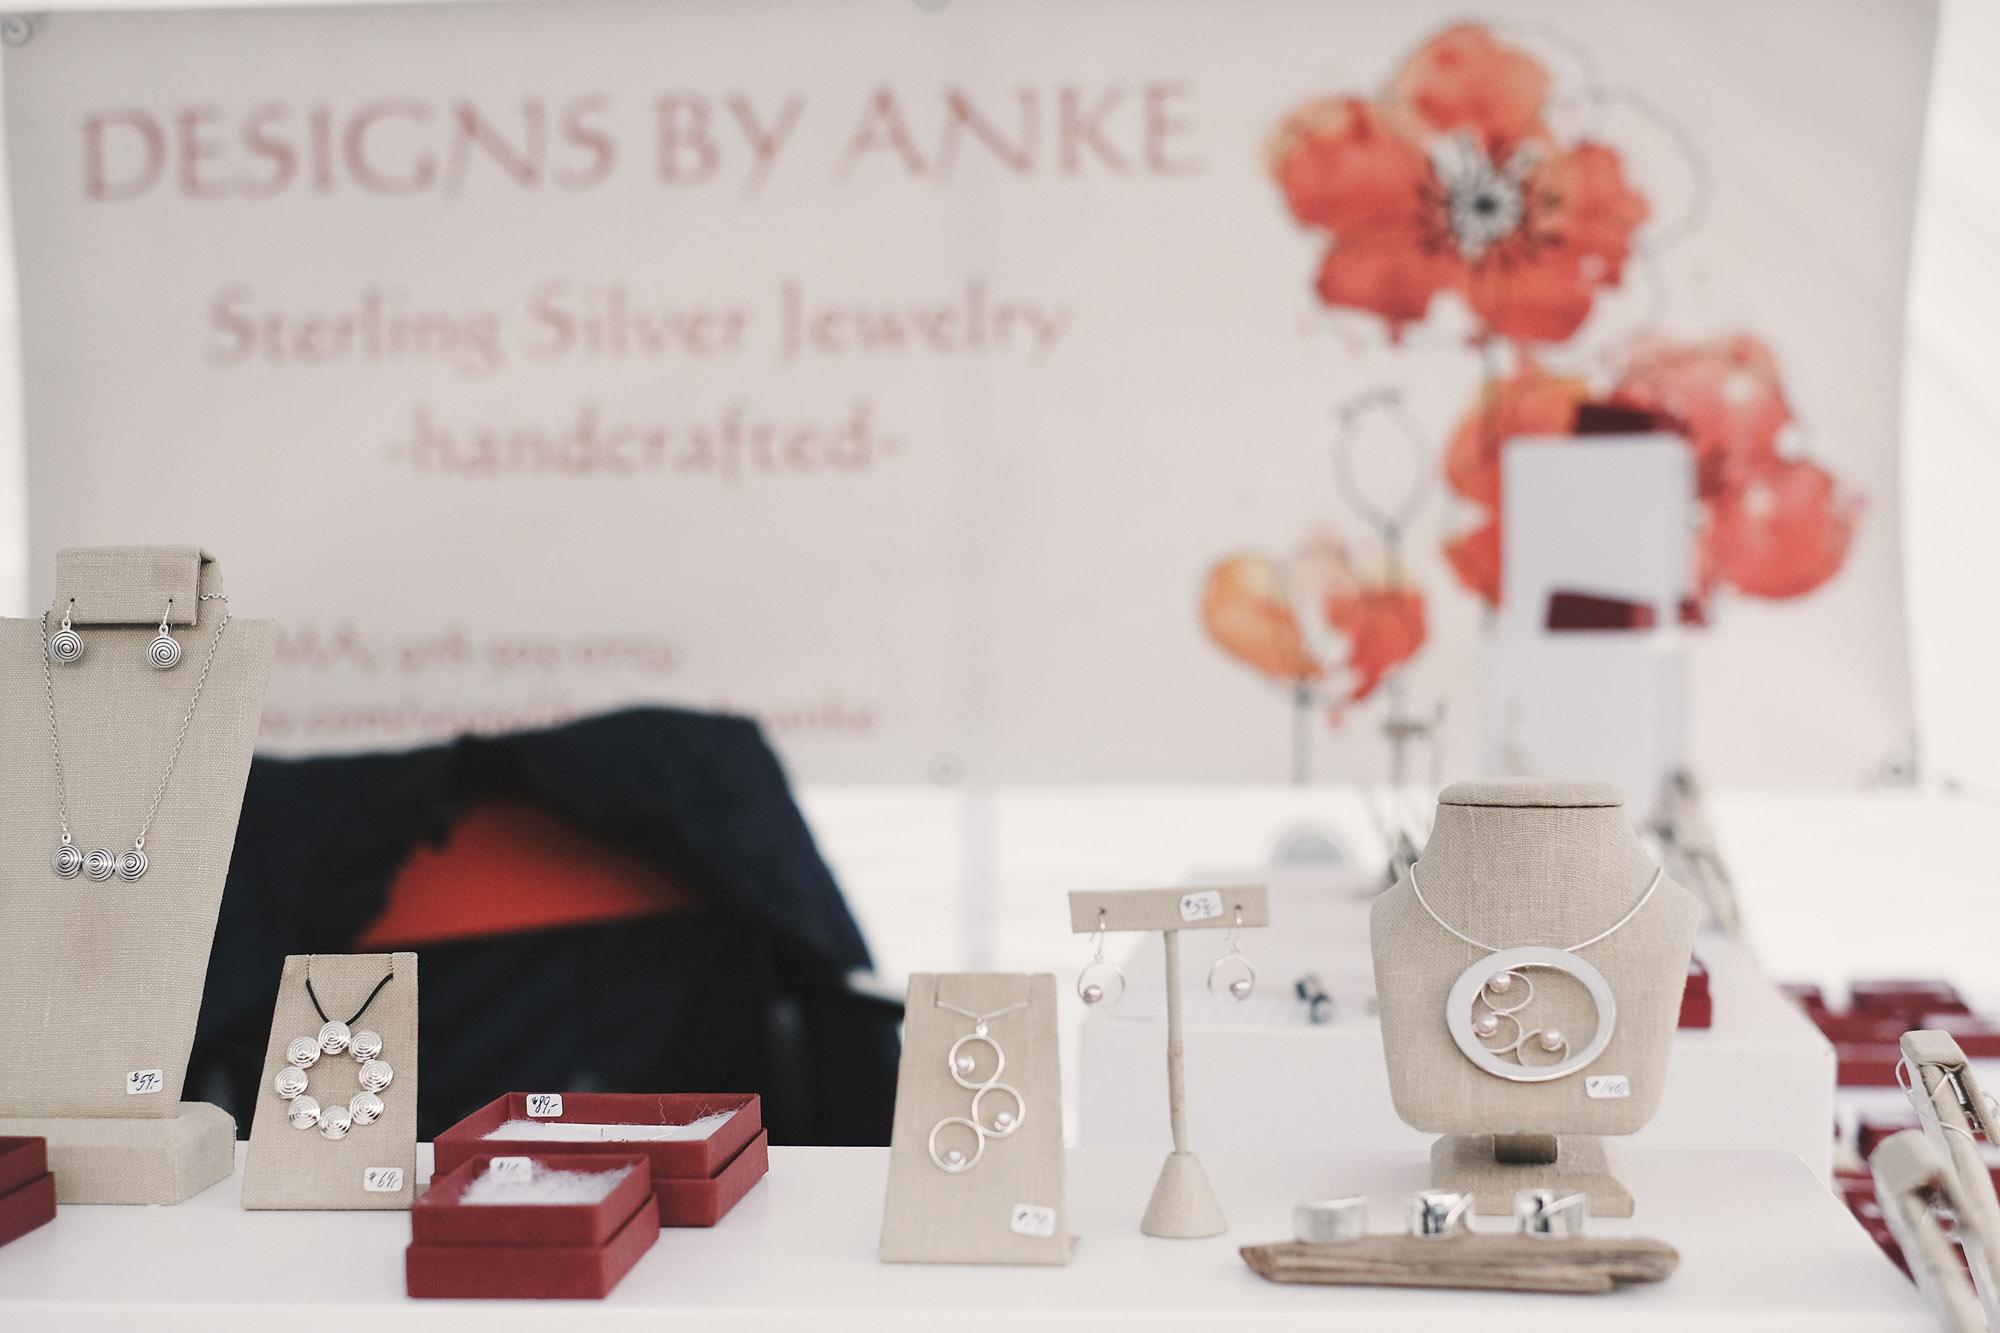 Designs by Anke